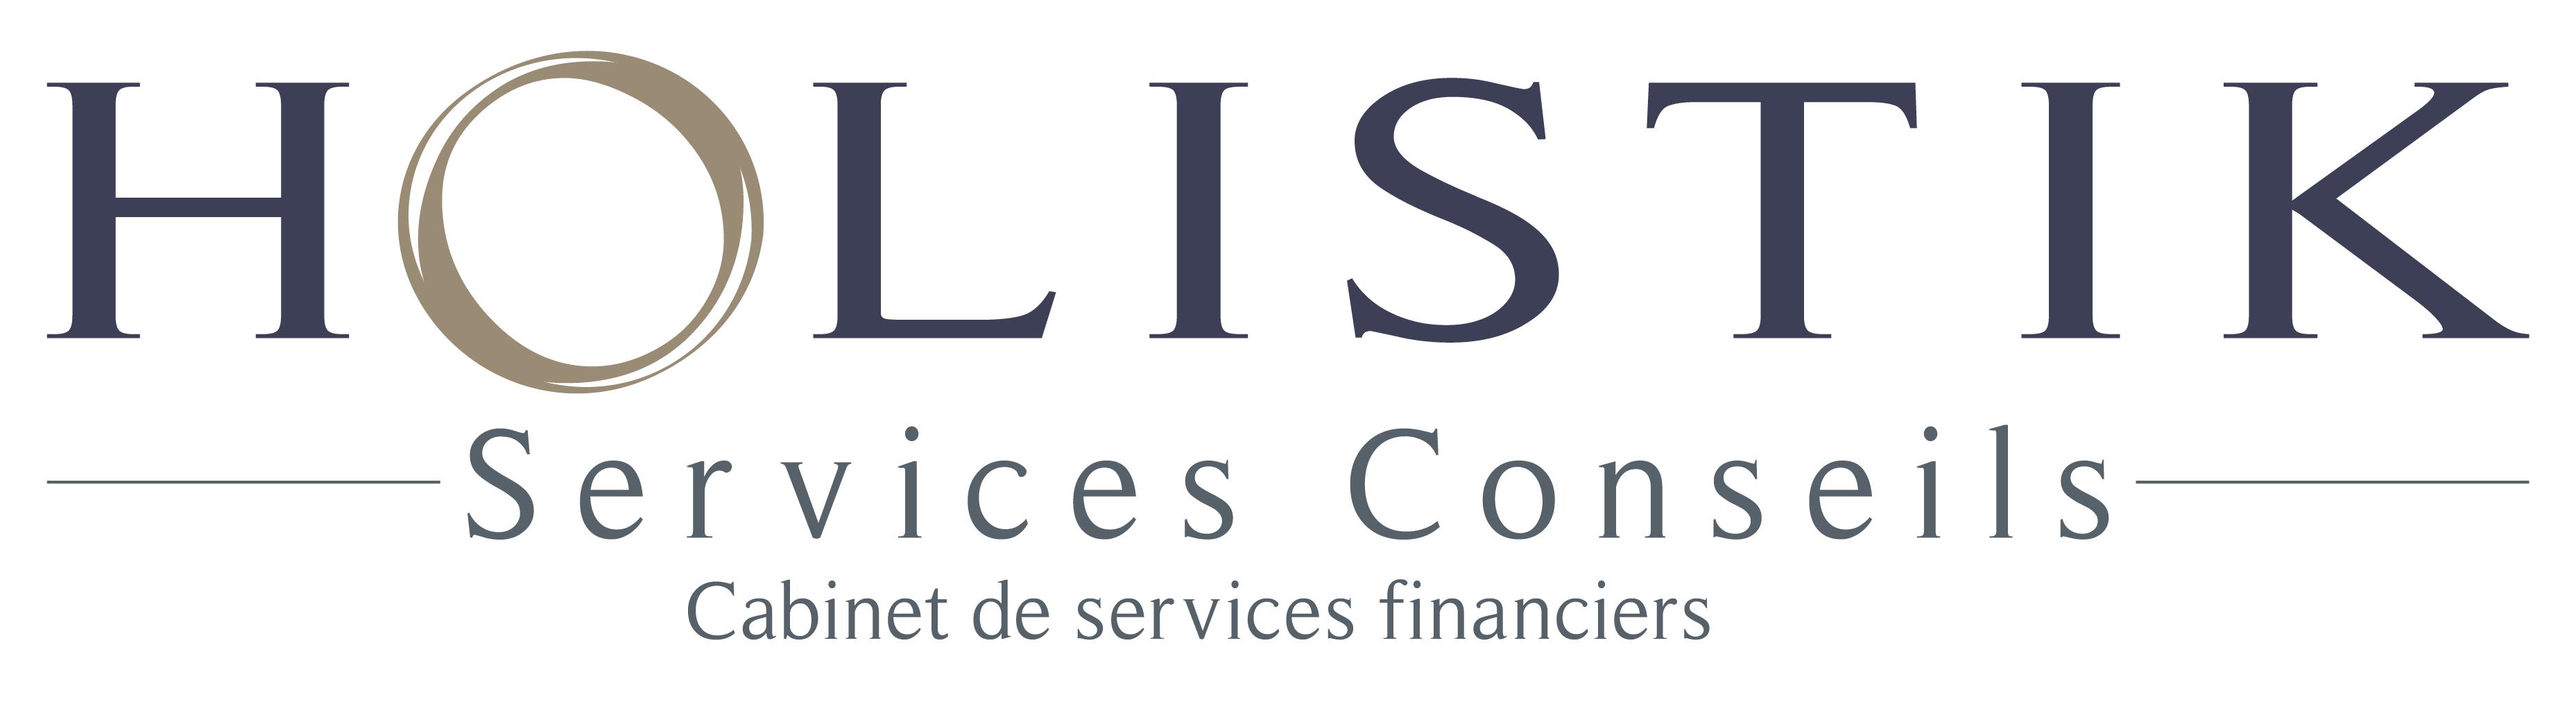 Holistik Services Conseils Inc.